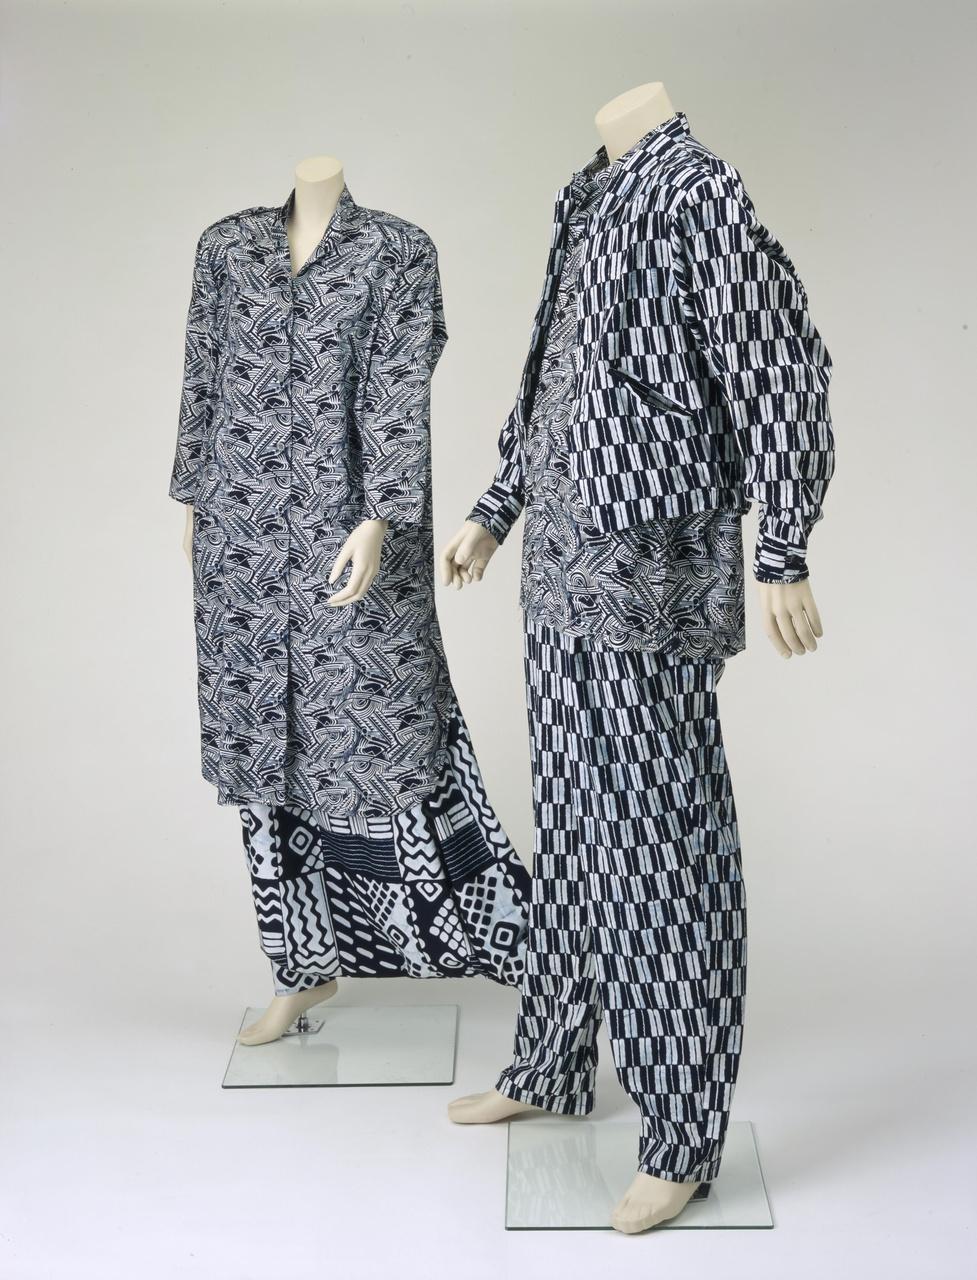 Herenensemble bestaande uit blouse, jas, broek en sjaal